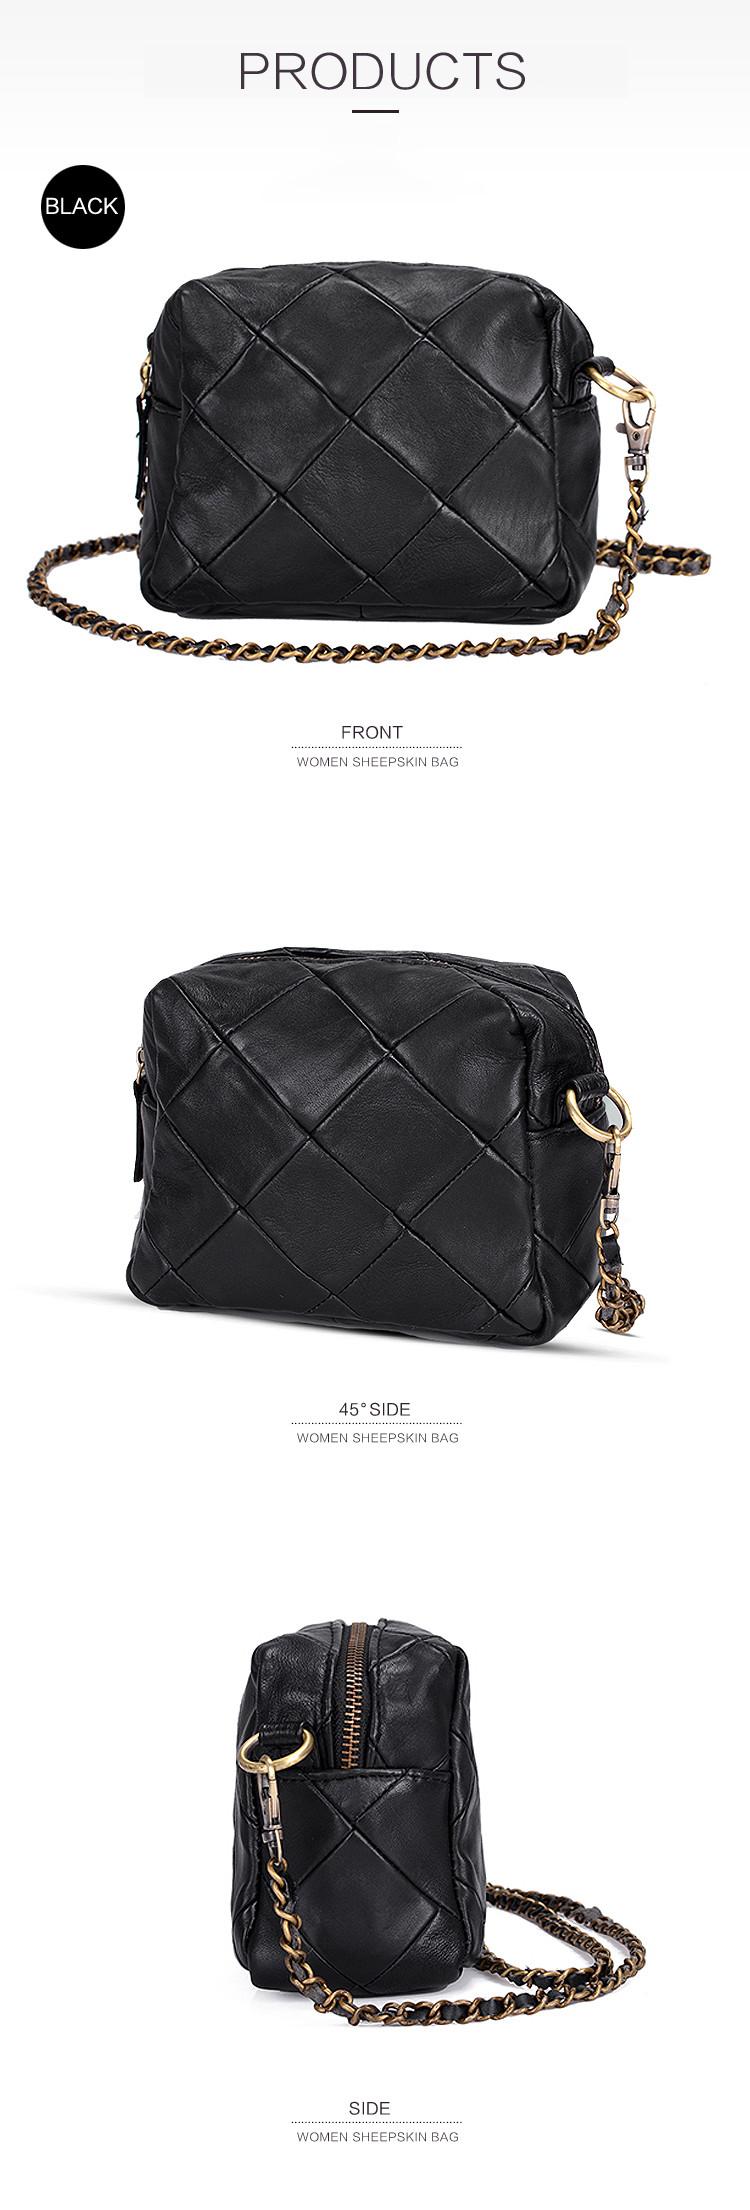 women-handbag02 (1)